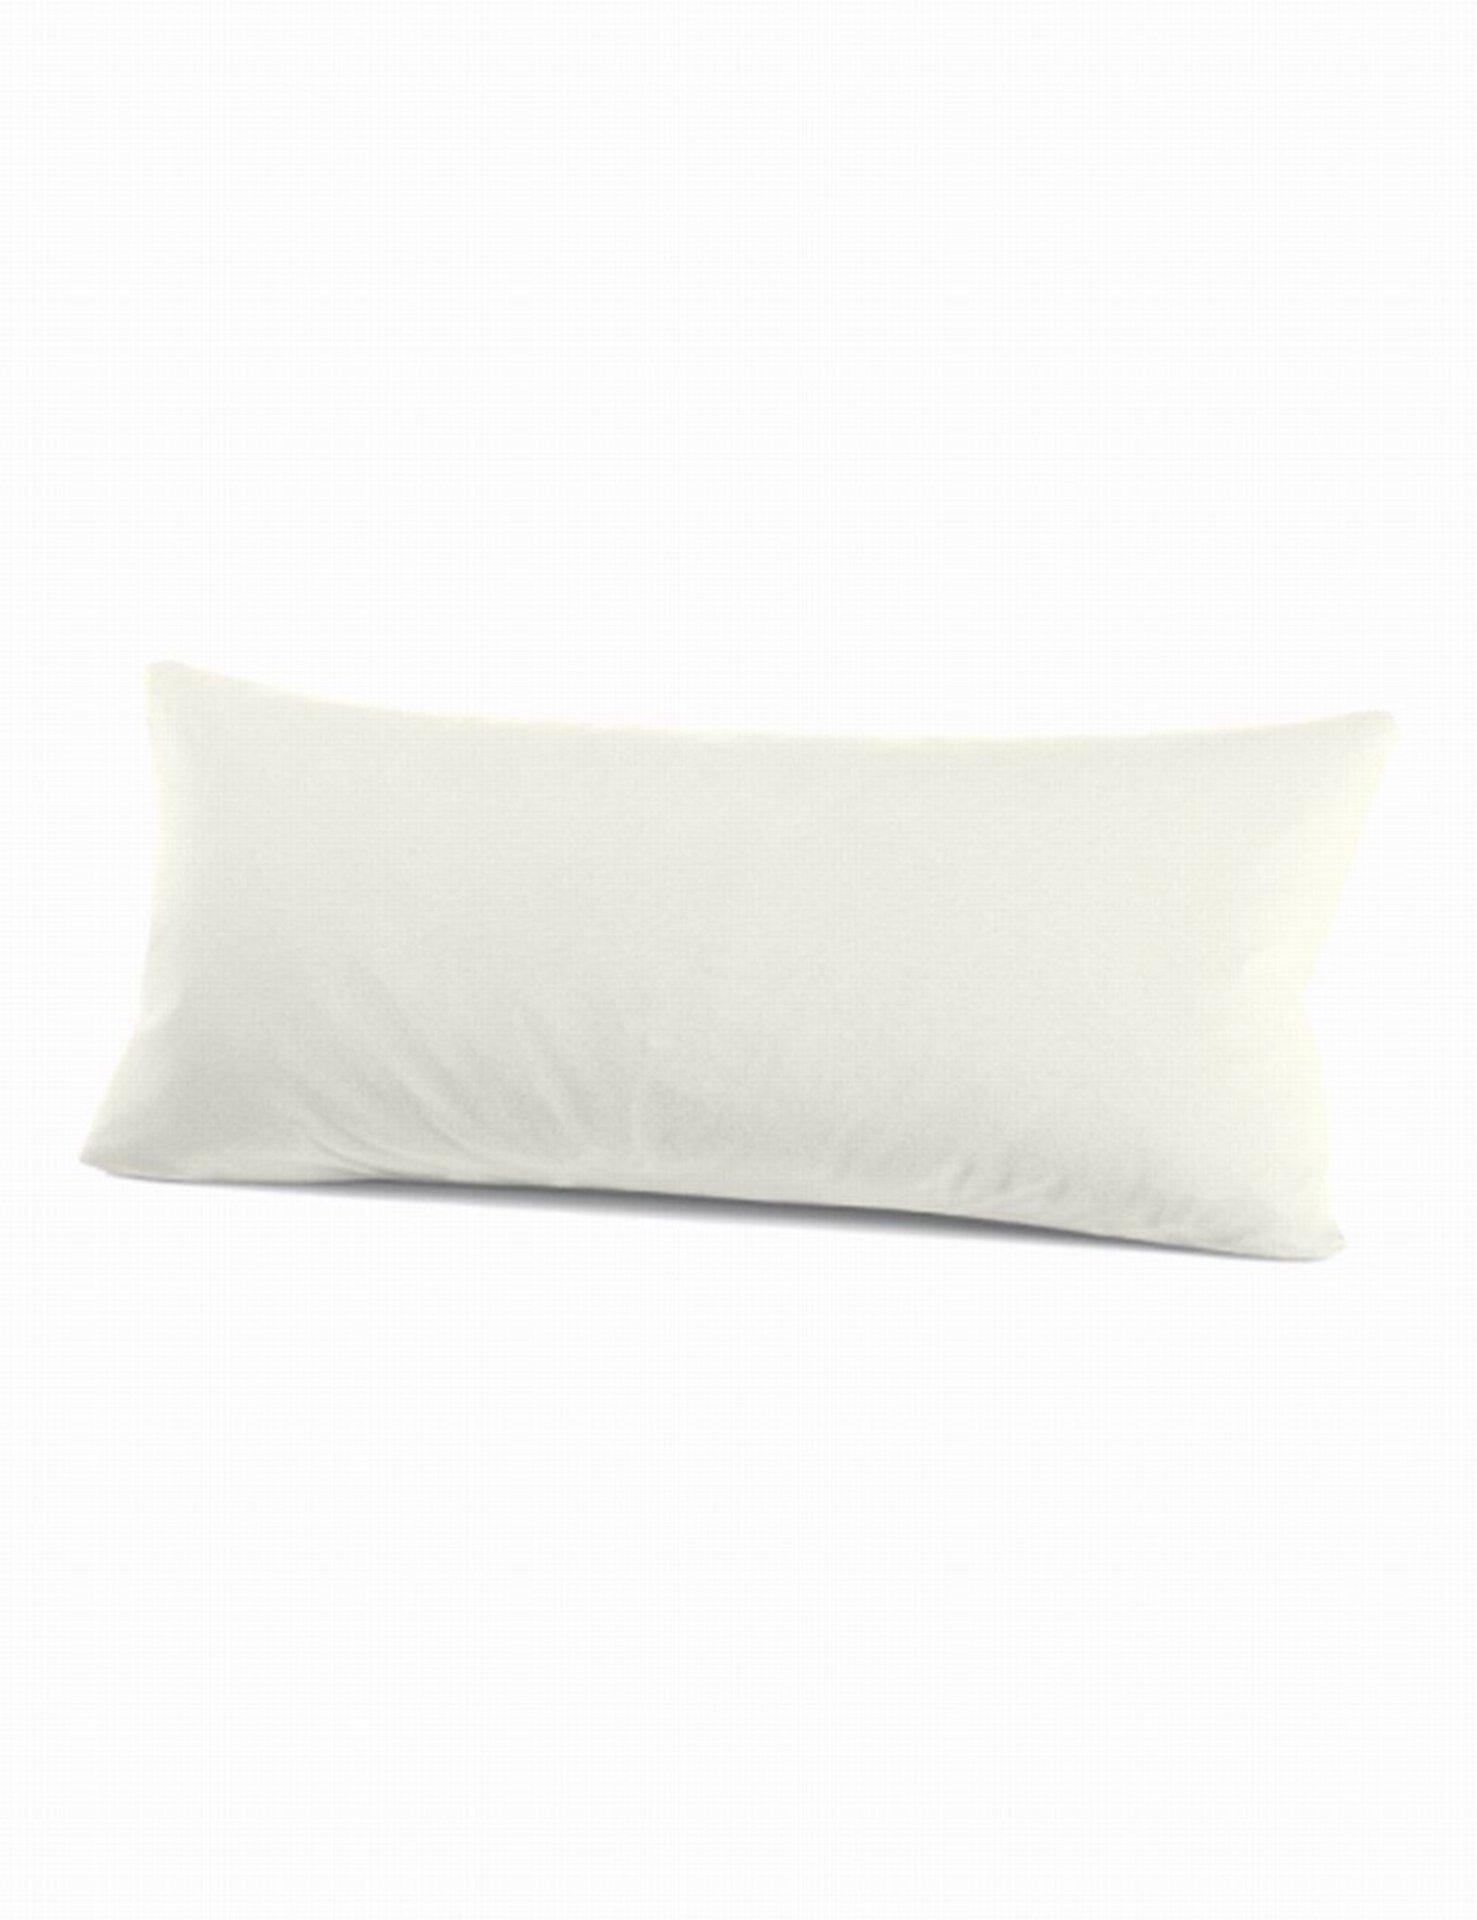 Kissenhülle Schlafgut Textil weiß 40 x 80 cm